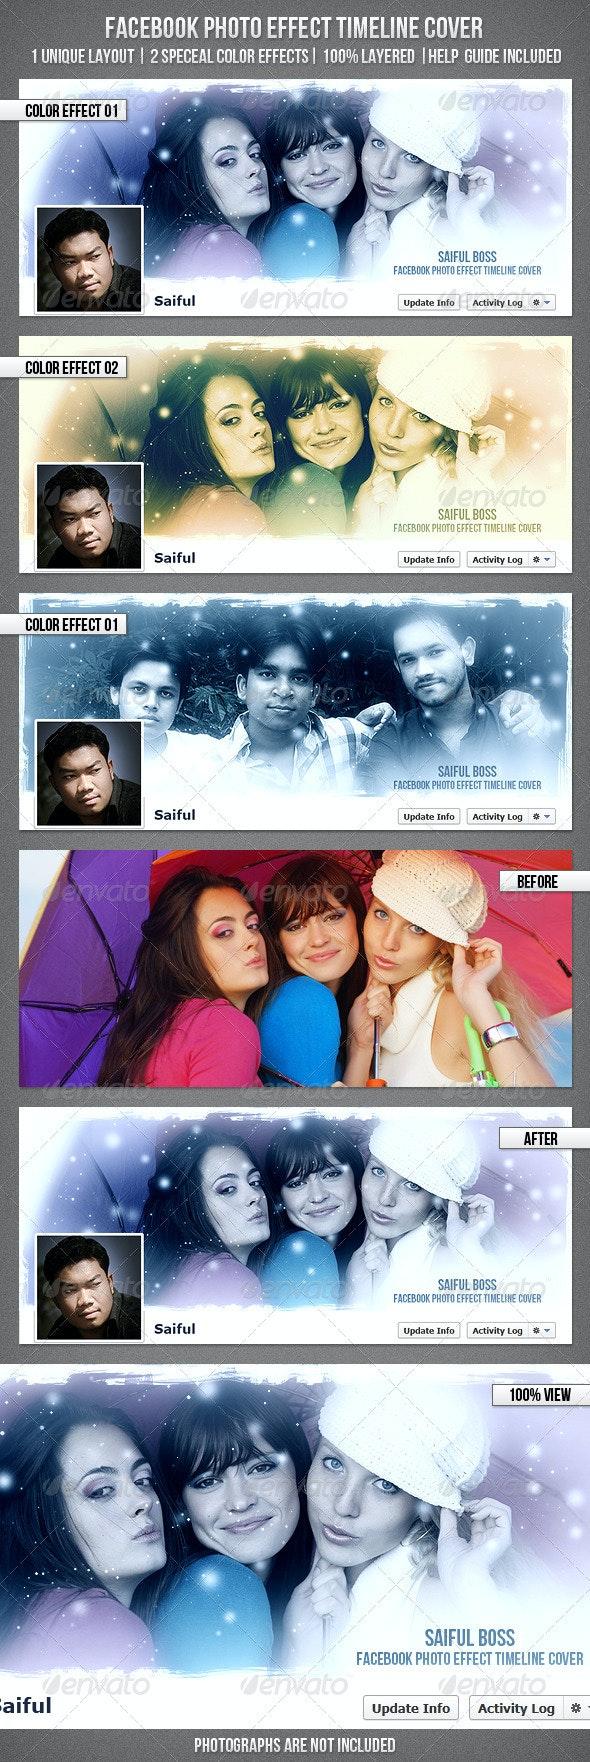 Facebook Photo Effect Timeline Cover - Facebook Timeline Covers Social Media